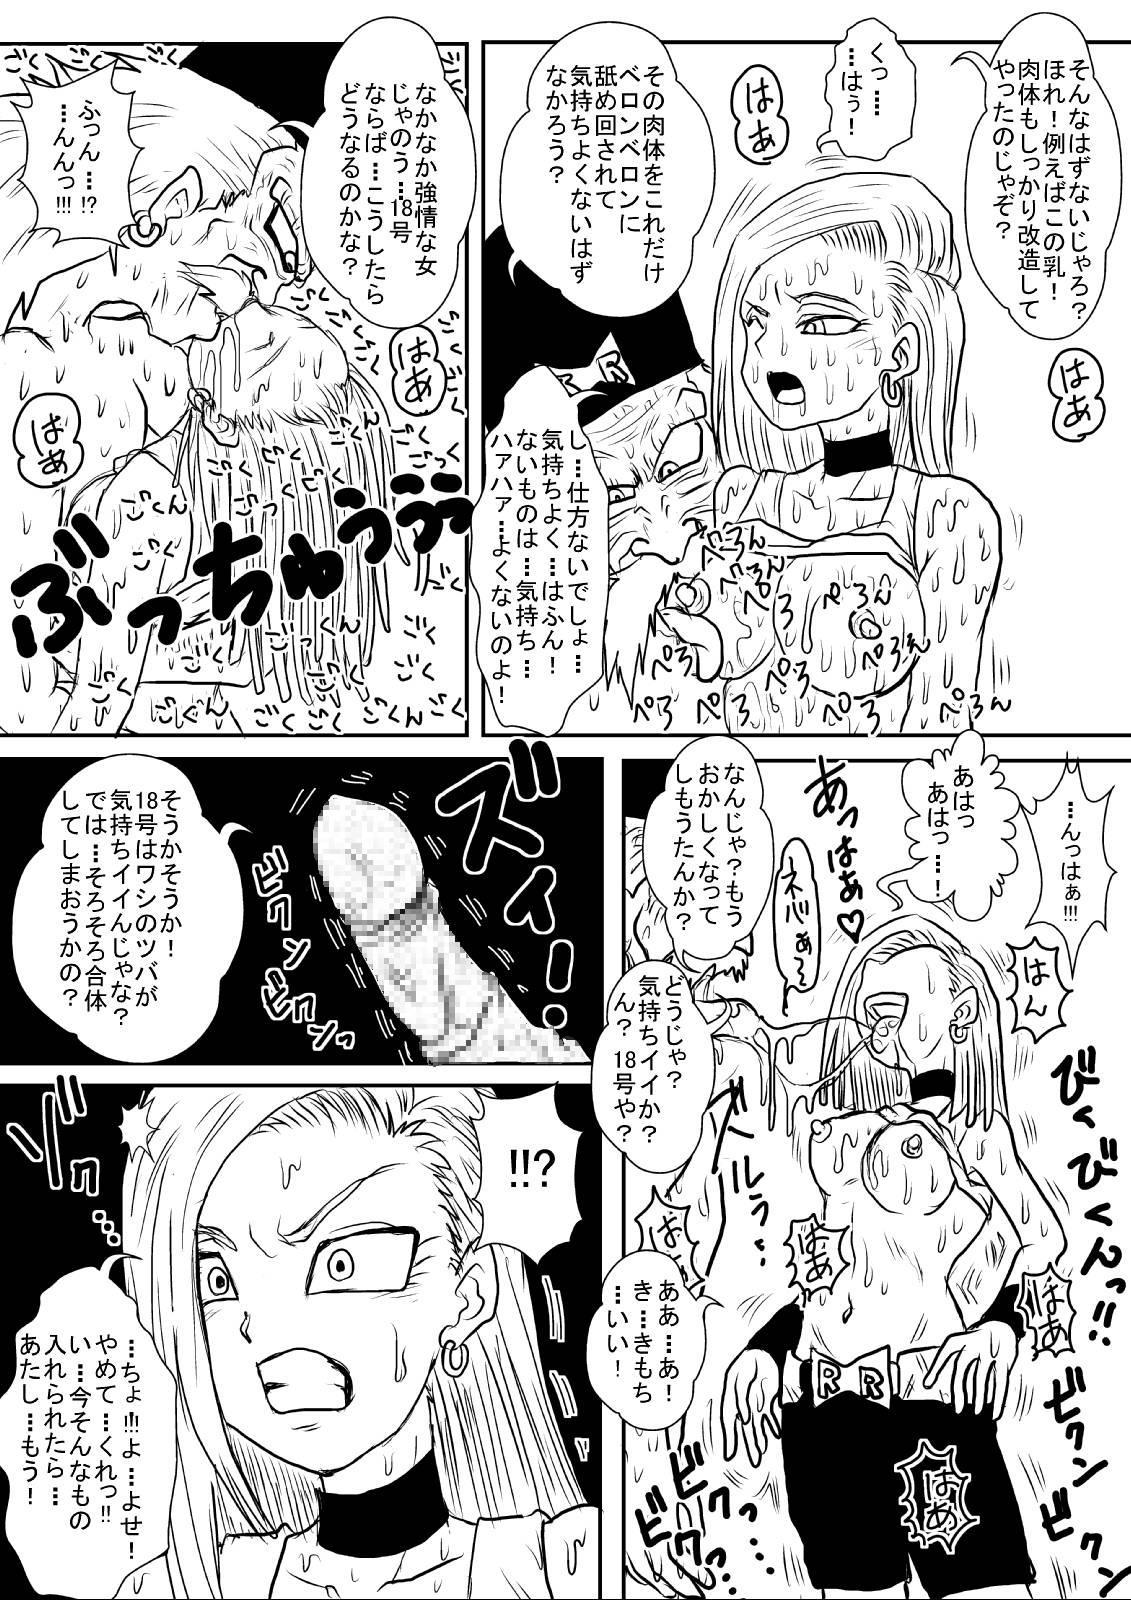 [Alice.Blood] Sennou Kyouiku-shitsu~ Jinzou ☆-kan 18-gou-hen (Dragon Ball Z) 30